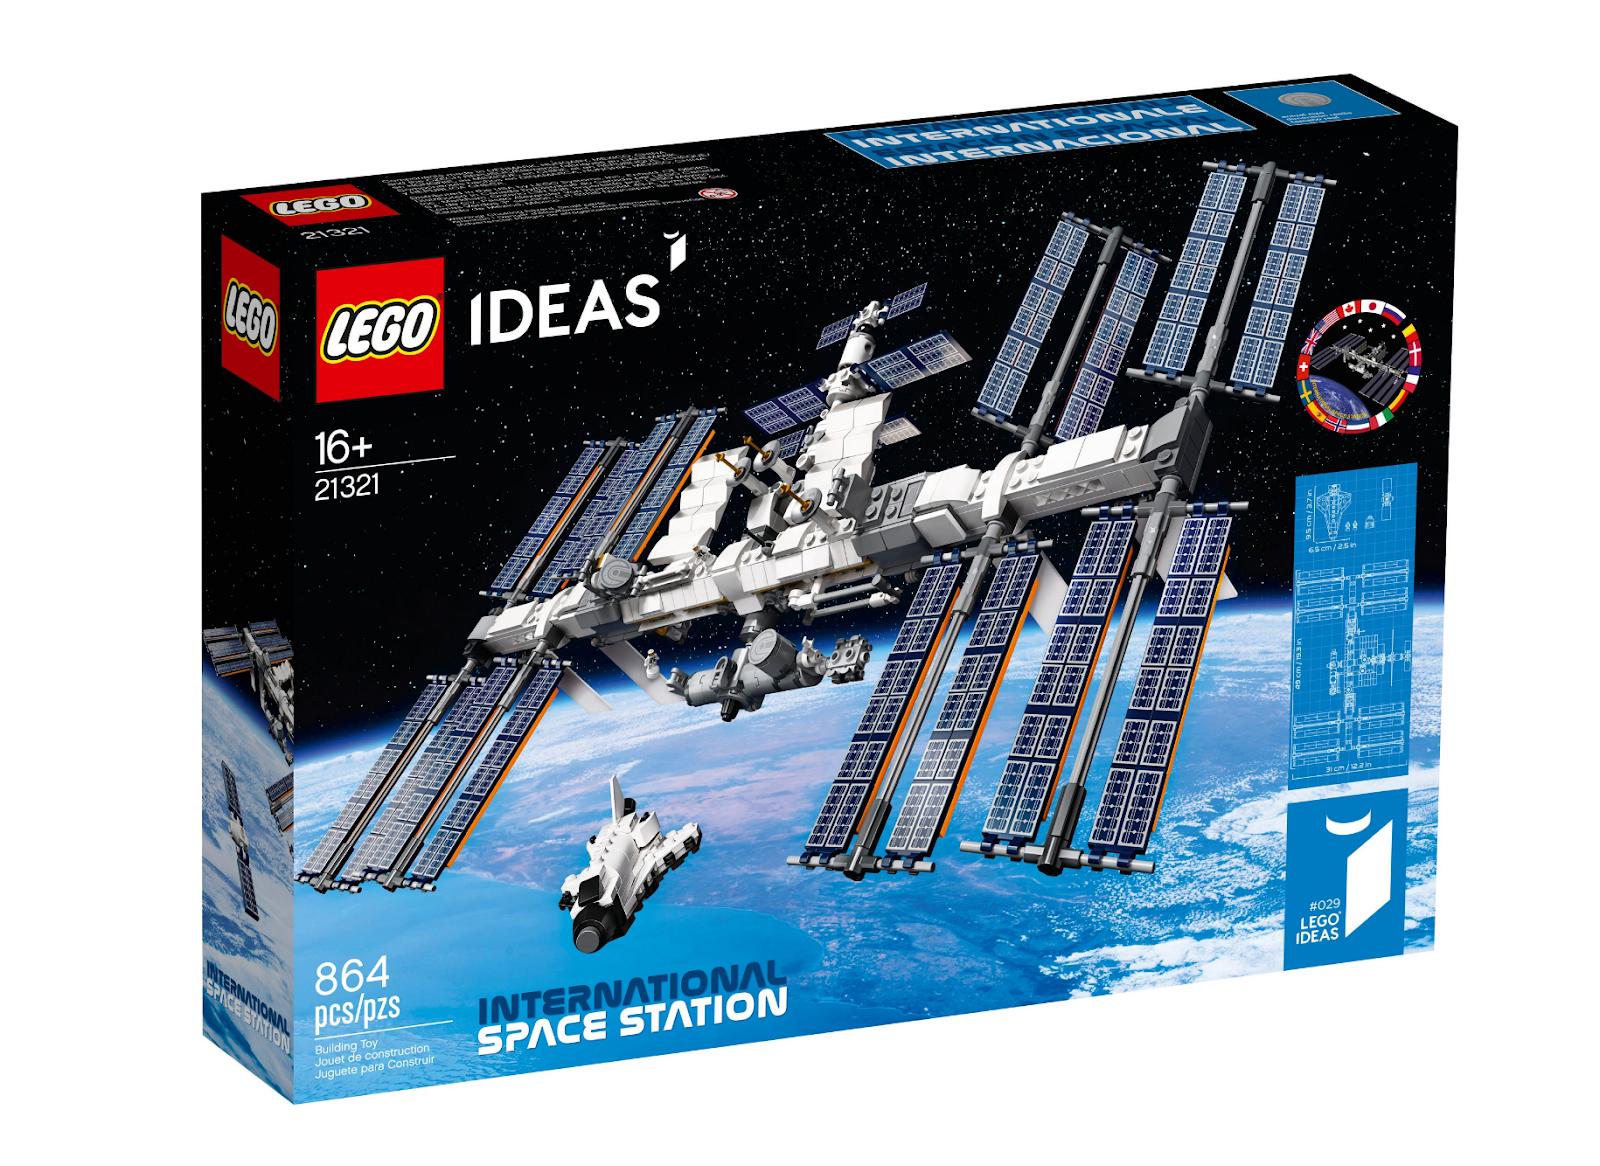 The International Space Station LEGO set